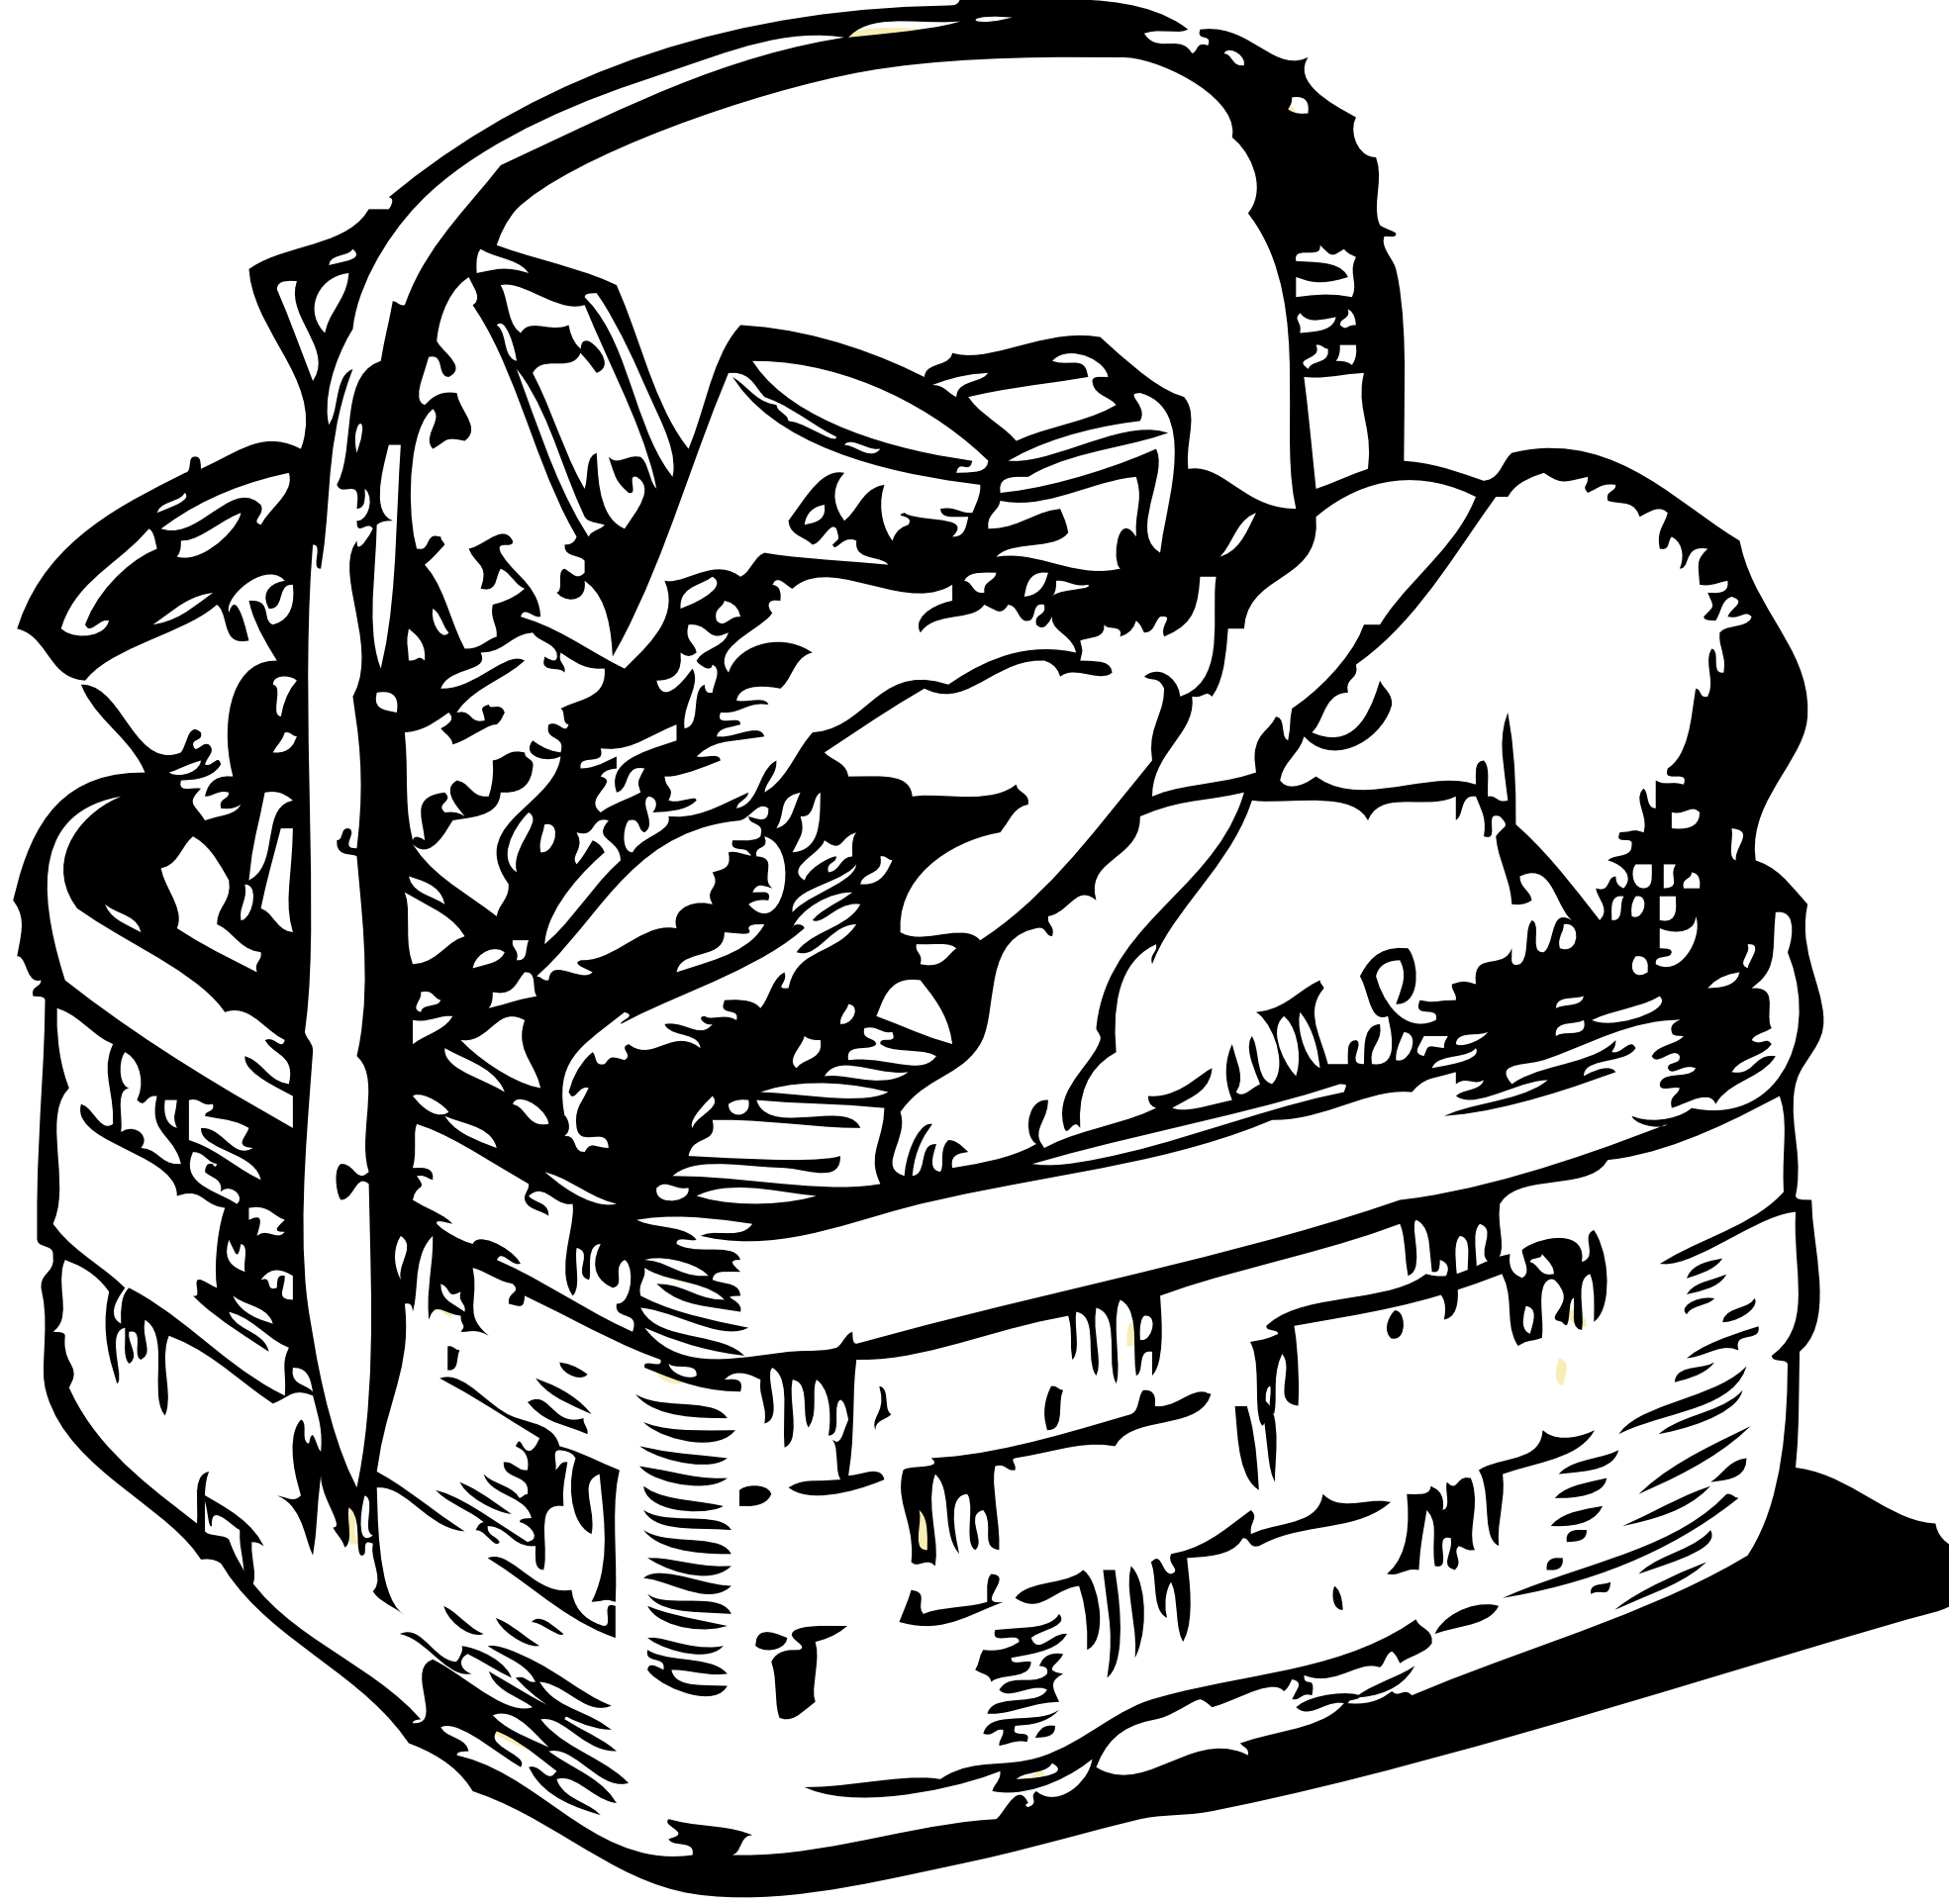 White Basket Clipart : Image gallery hamper clip art